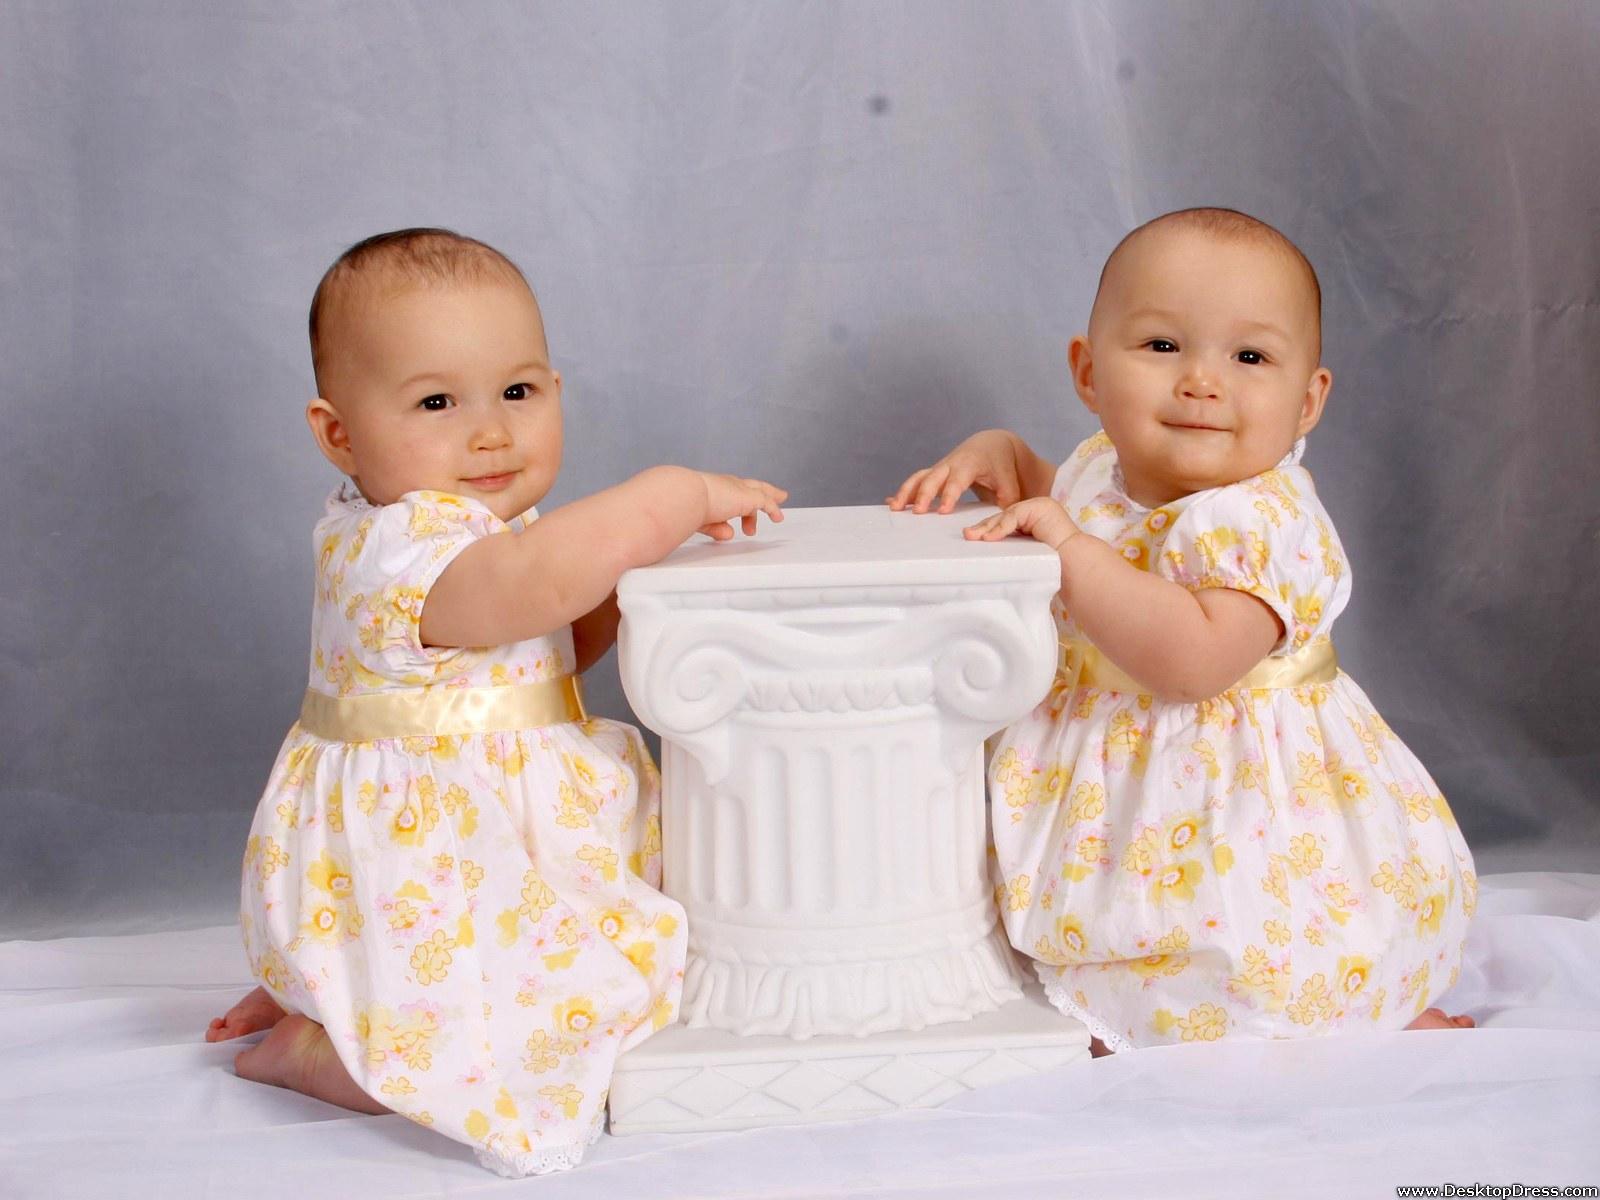 desktop wallpapers » babies backgrounds » cute twins baby girls